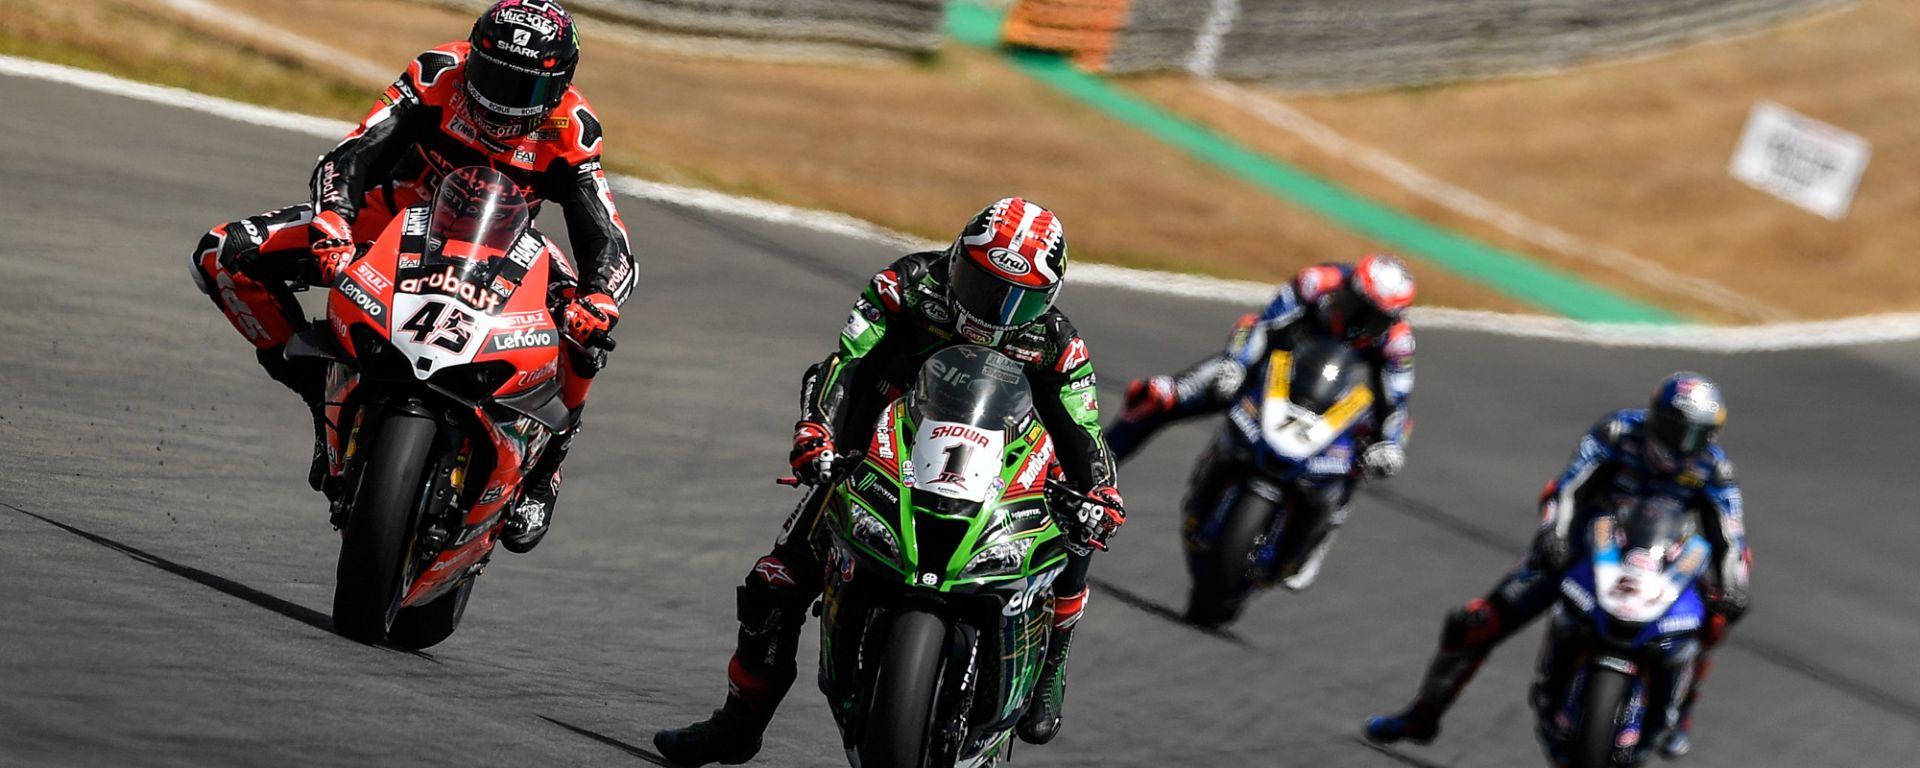 Scott Redding (Ducati) e Jonathan Rea (Kawasaki)